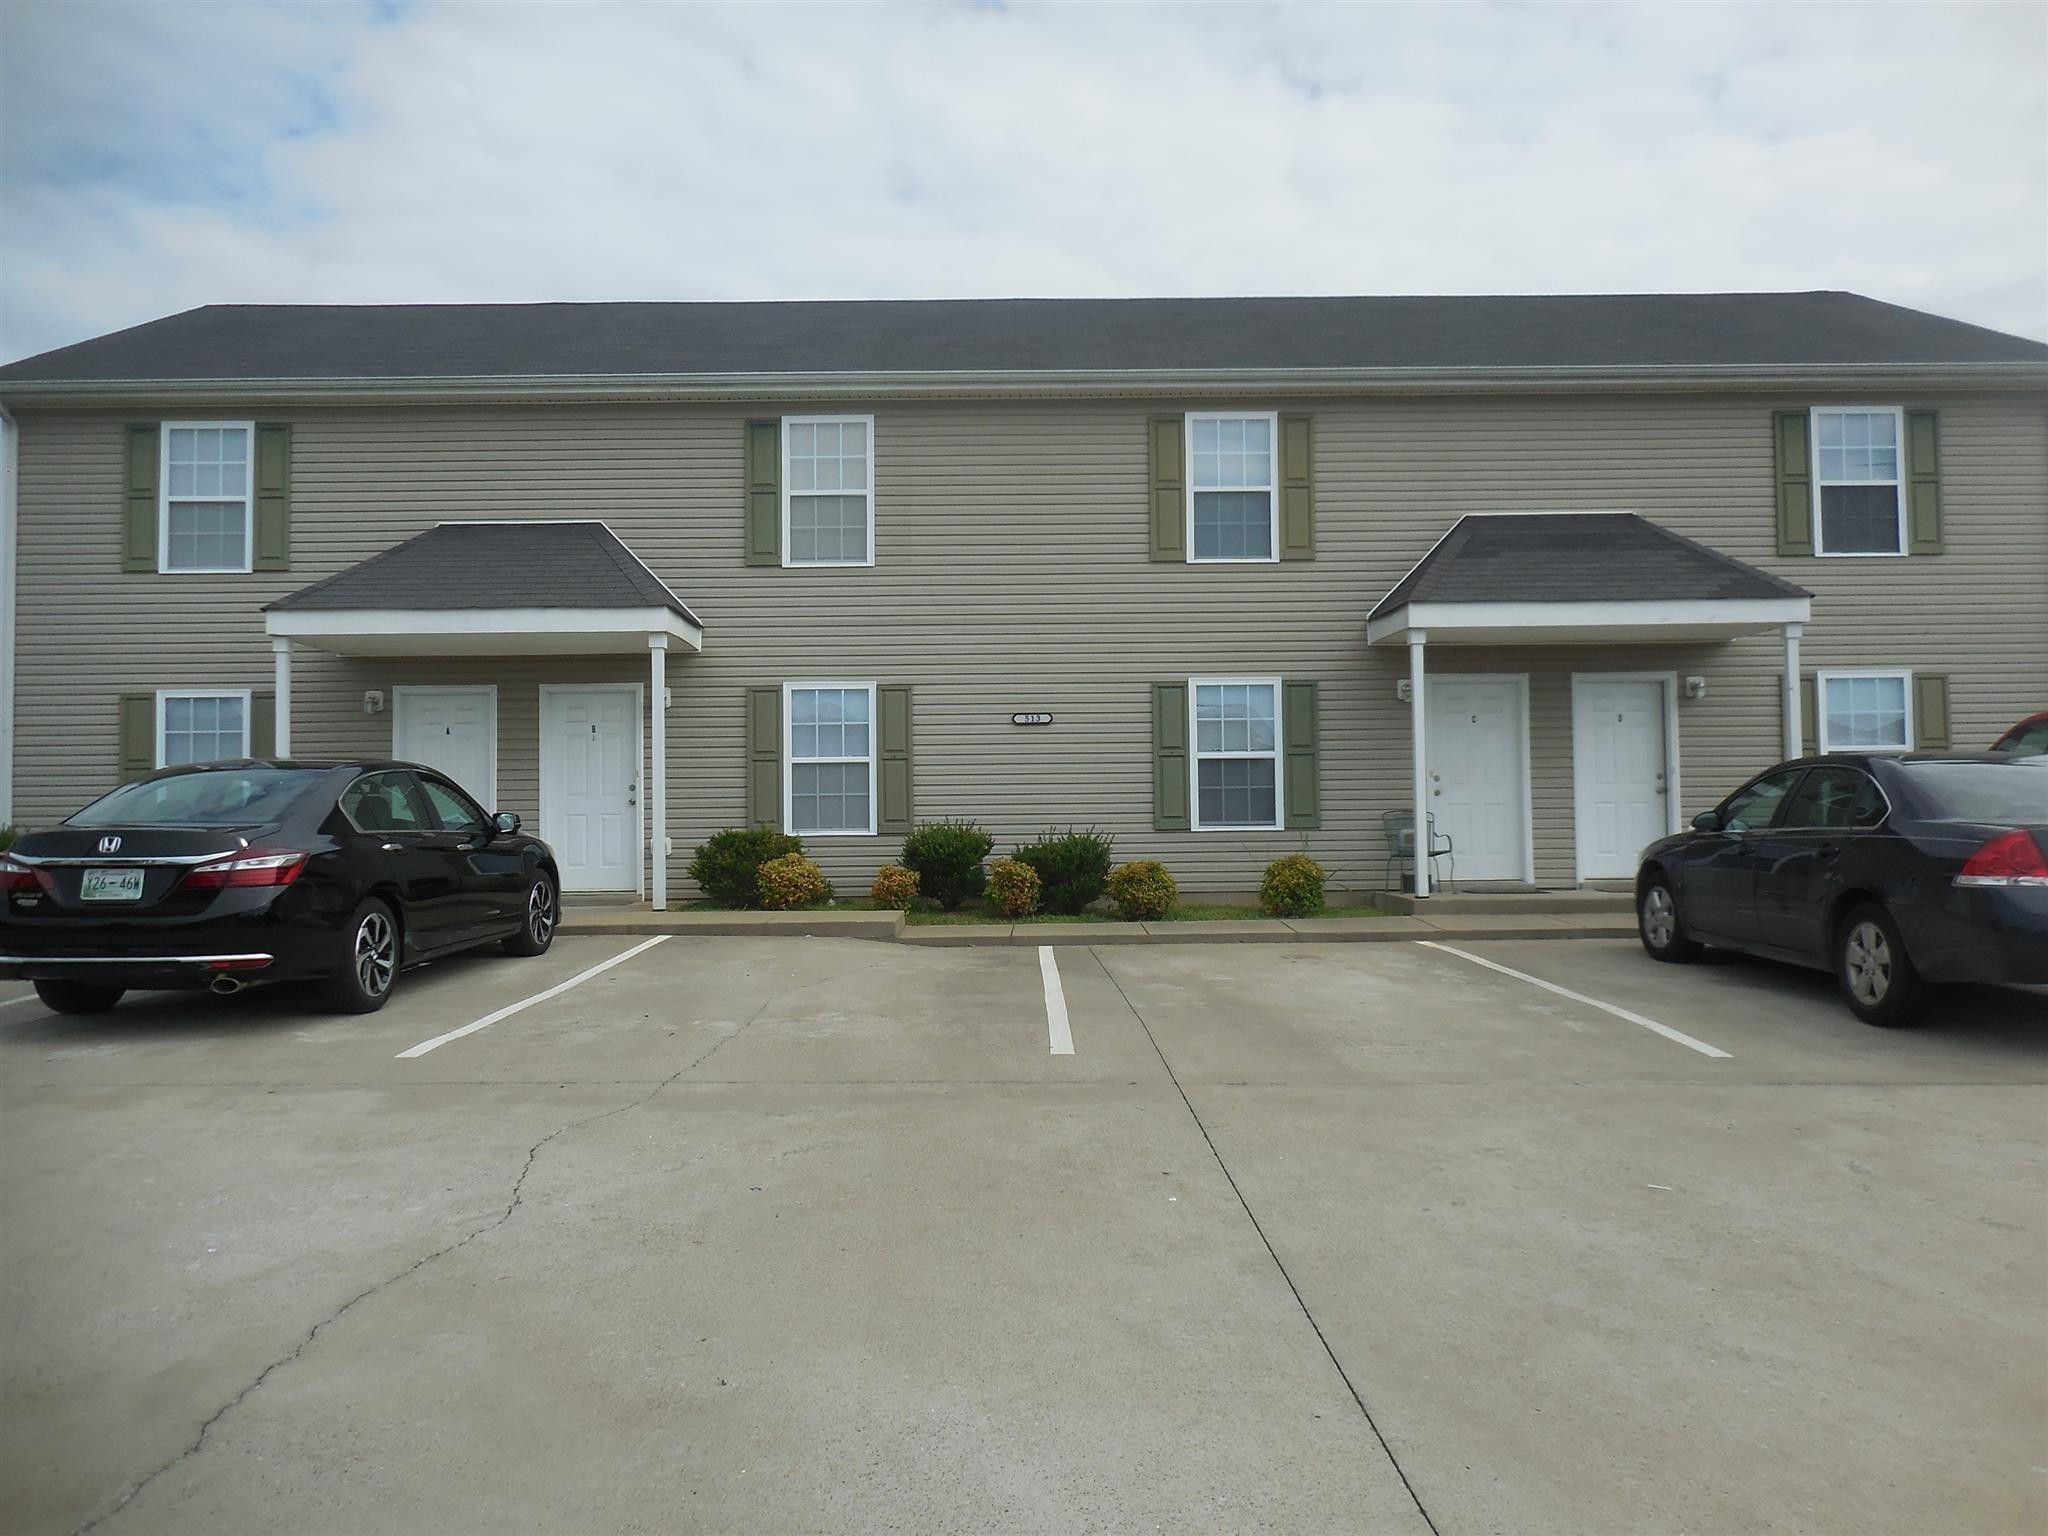 509 Patriot Park Property Photo - Clarksville, TN real estate listing